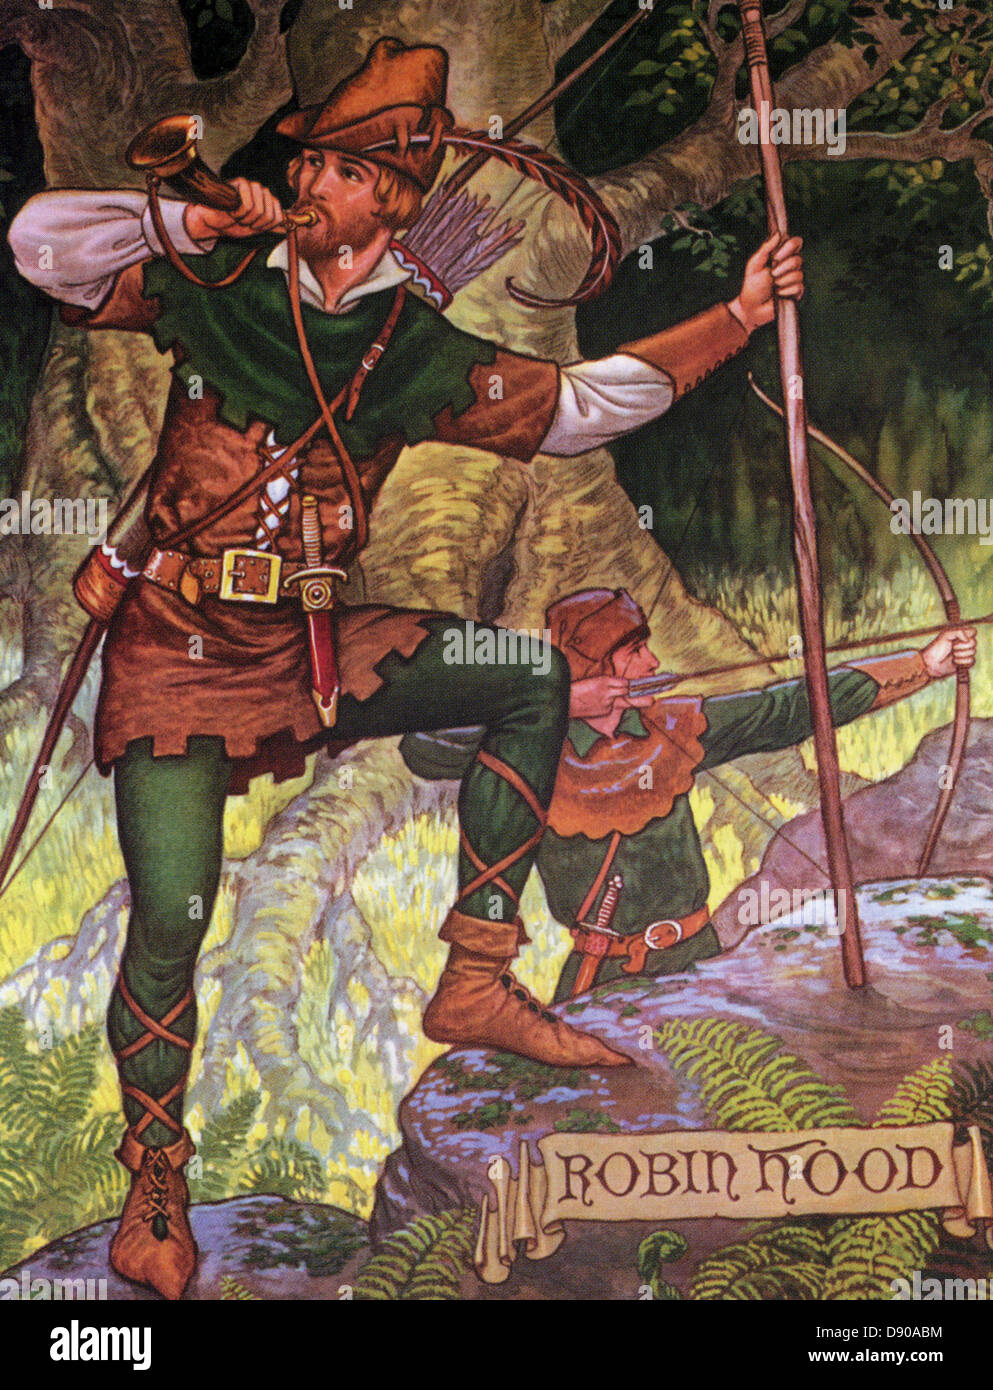 ROBIN HOOD  British folklore hero in a 1930s book - Stock Image